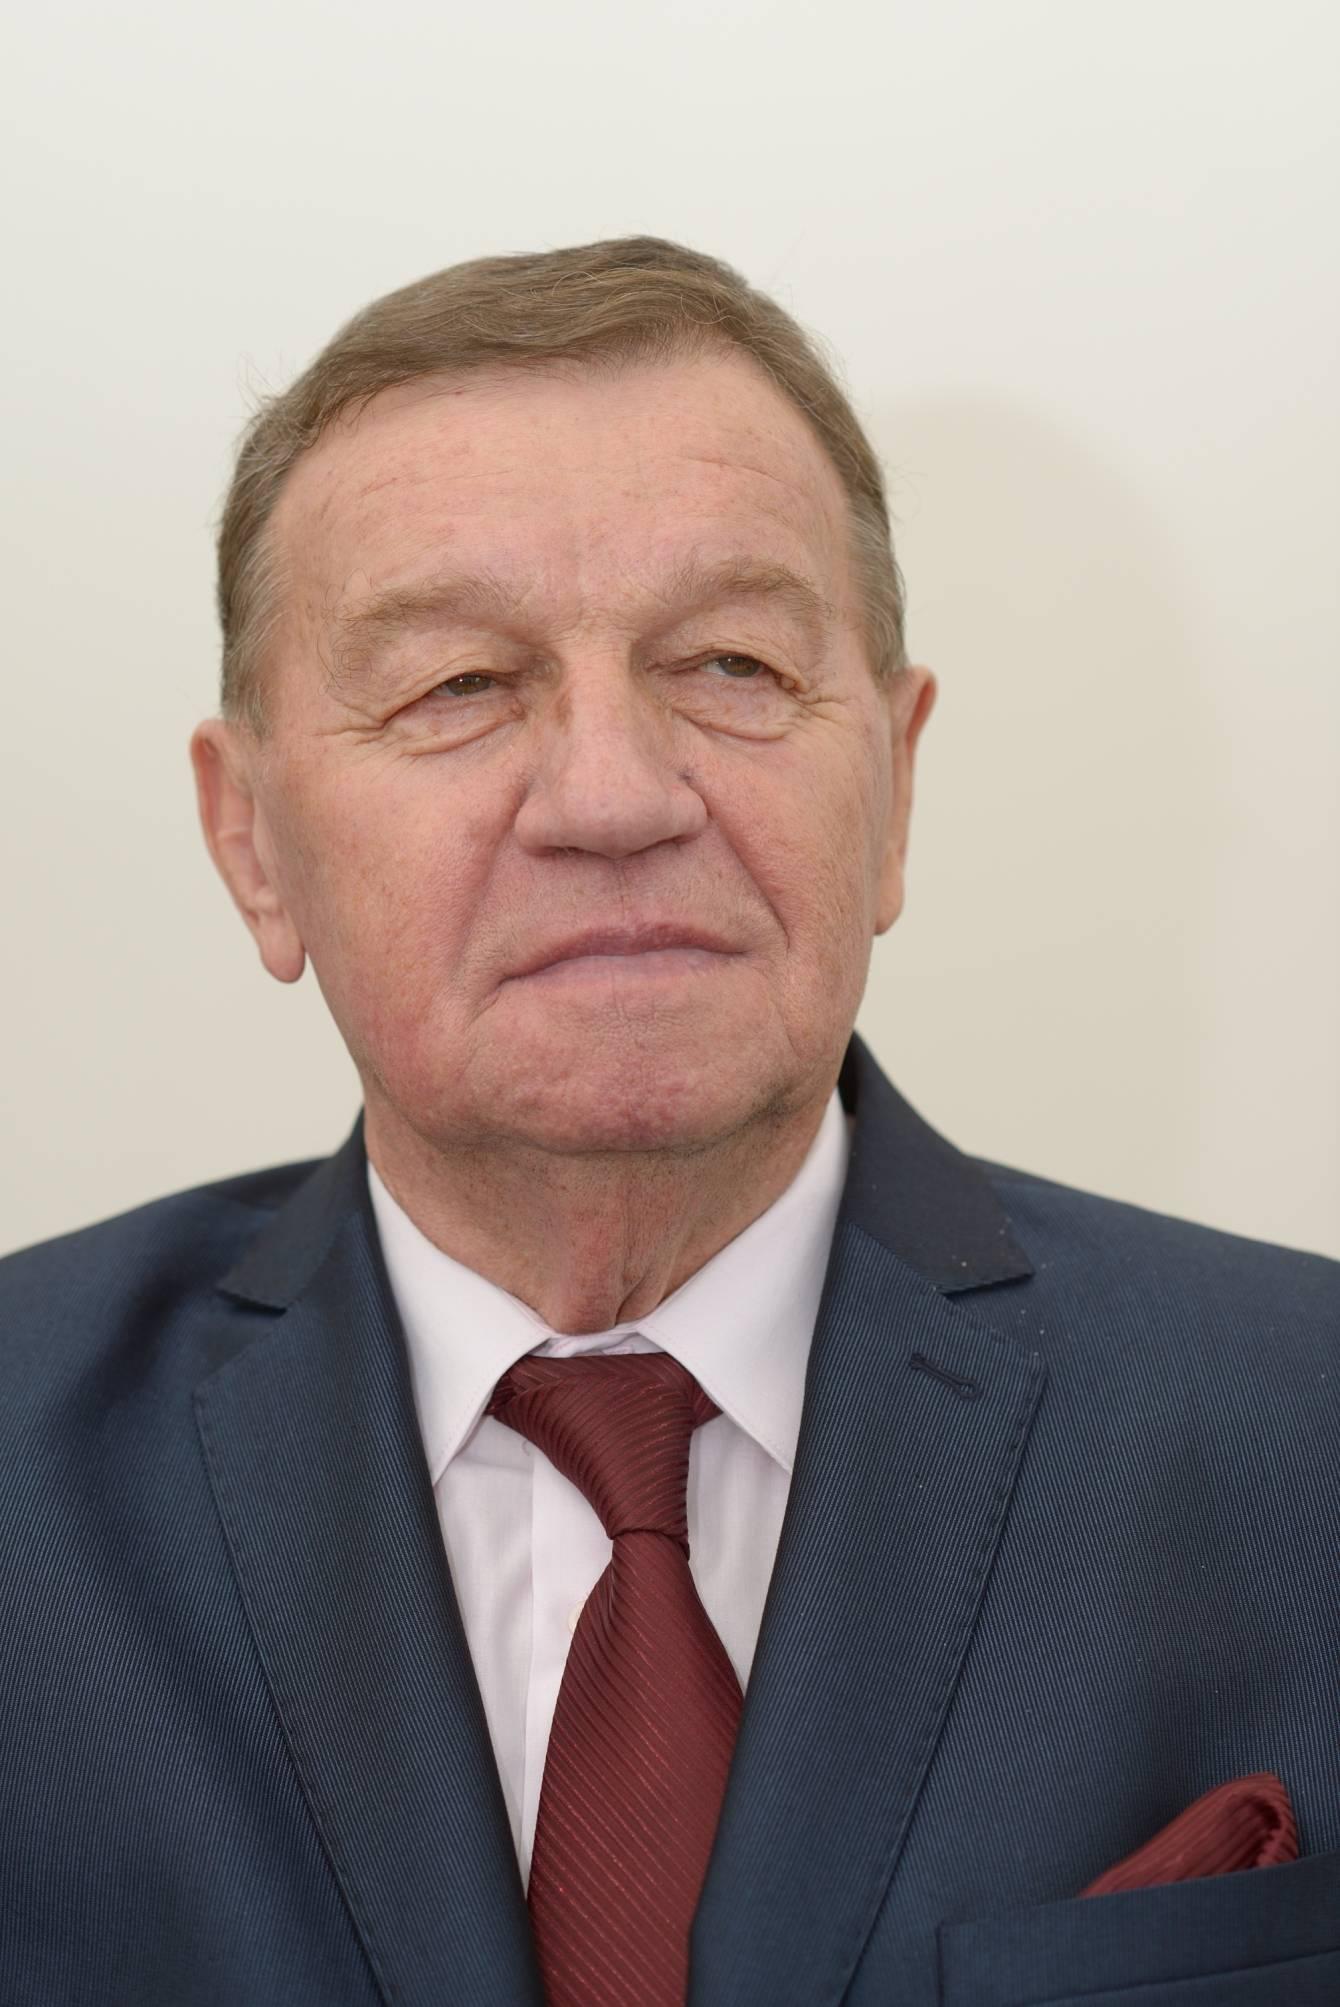 JUDr. Štefan Martinkovič